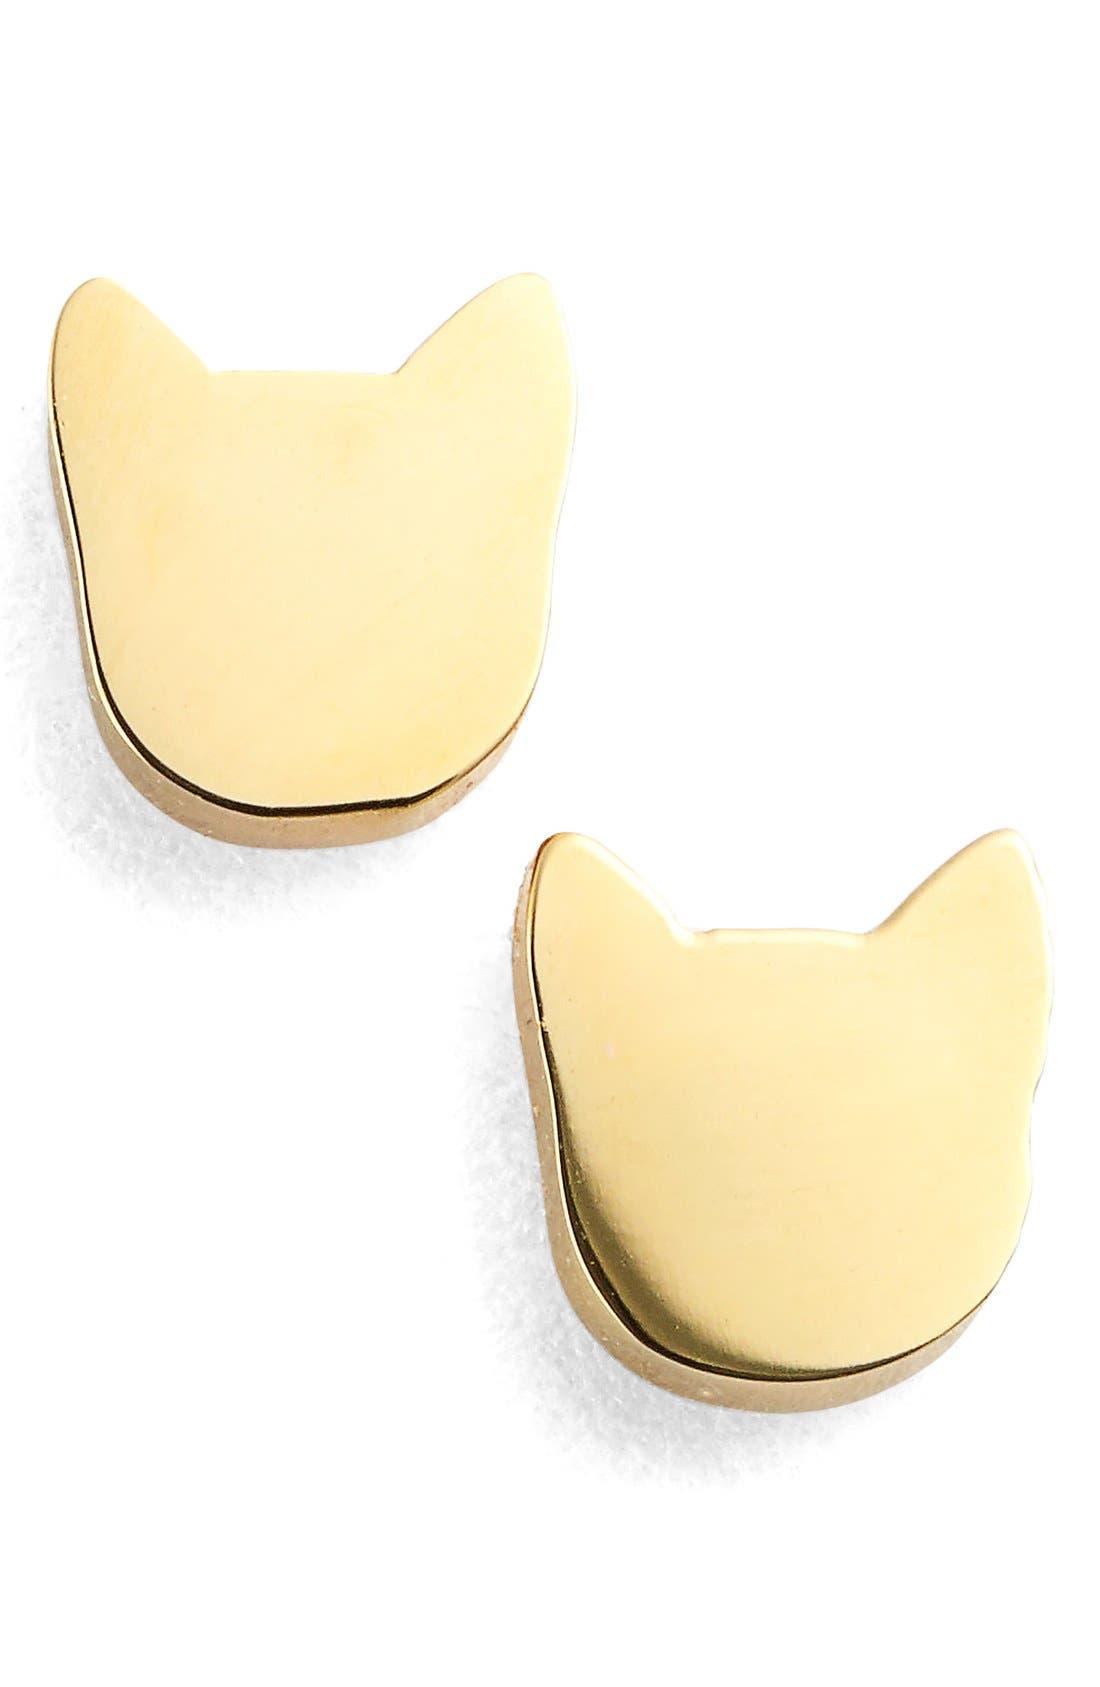 Main Image - Seoul Little Cat Stud Earrings